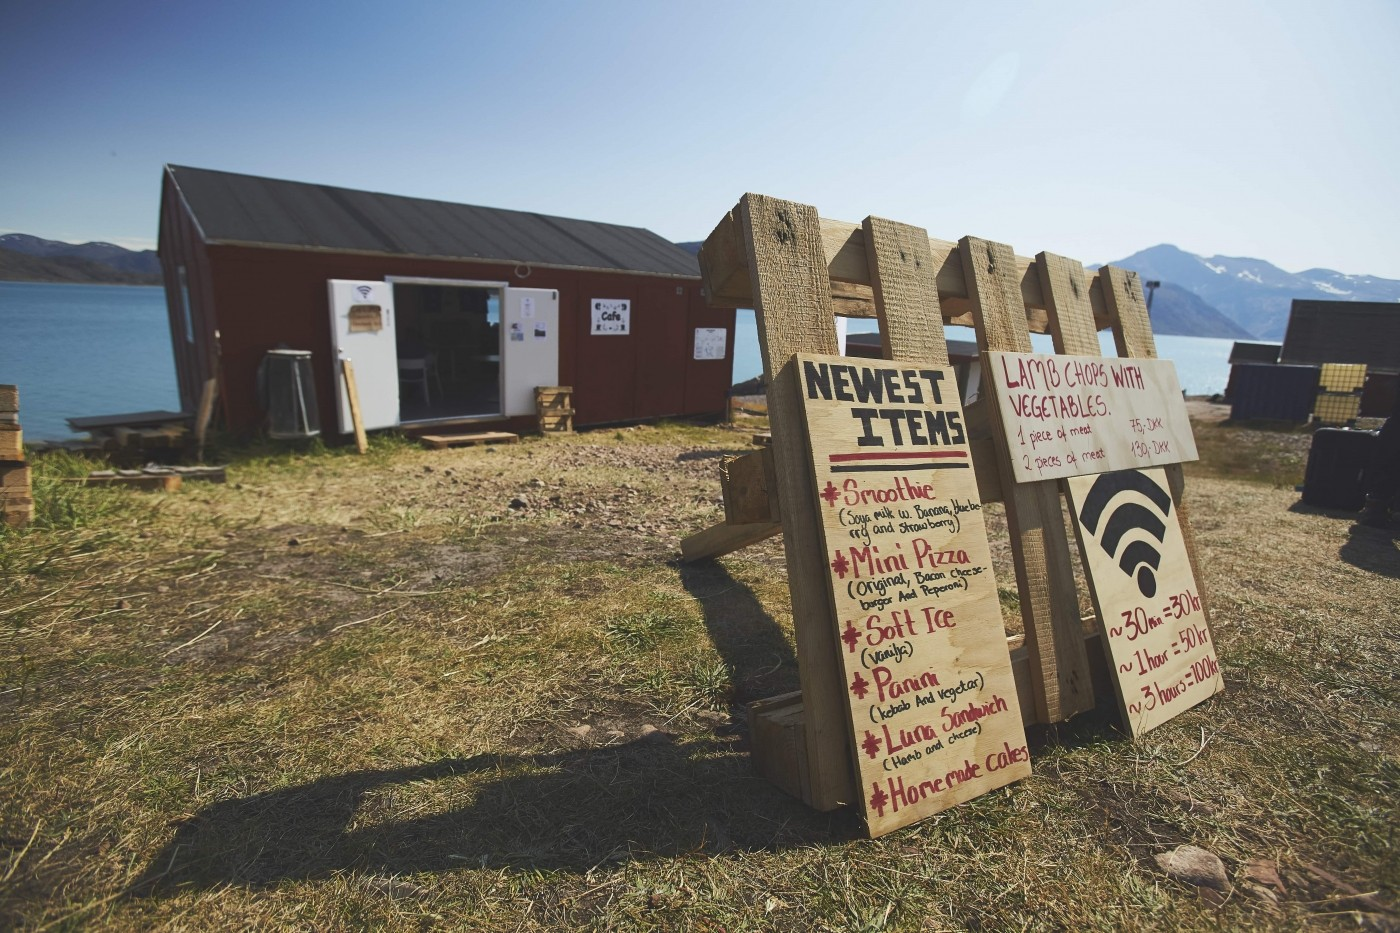 Cafe Thorhildur frontside sign. Photo by Aningaaq Rosing Carlsen - Visit Greenland